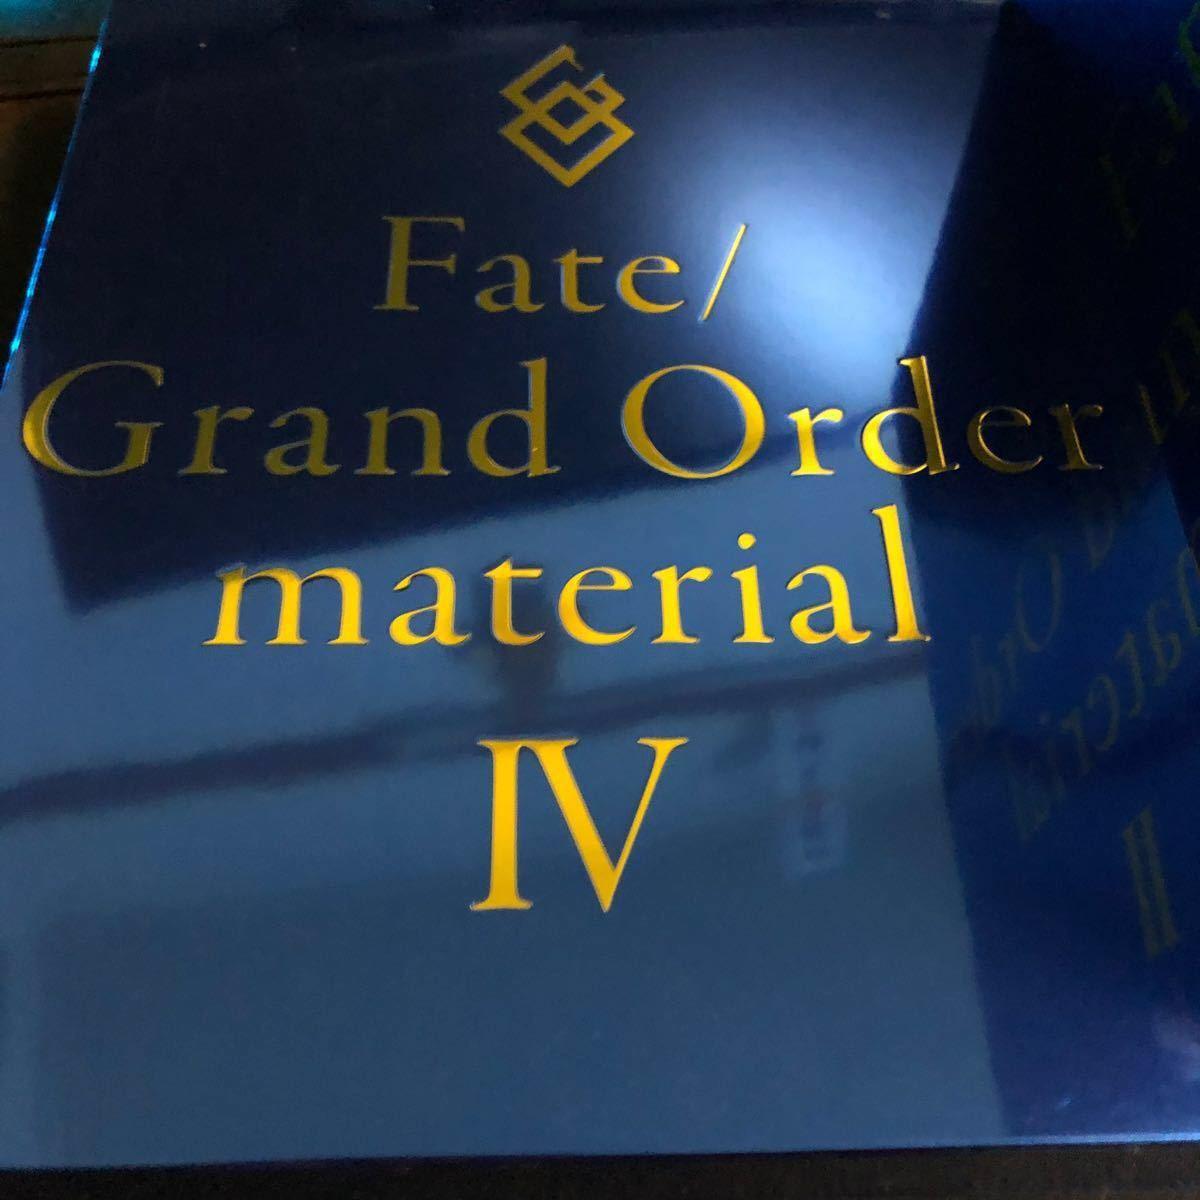 Fate/Grand Order material 1-4セット FGO マテリアル